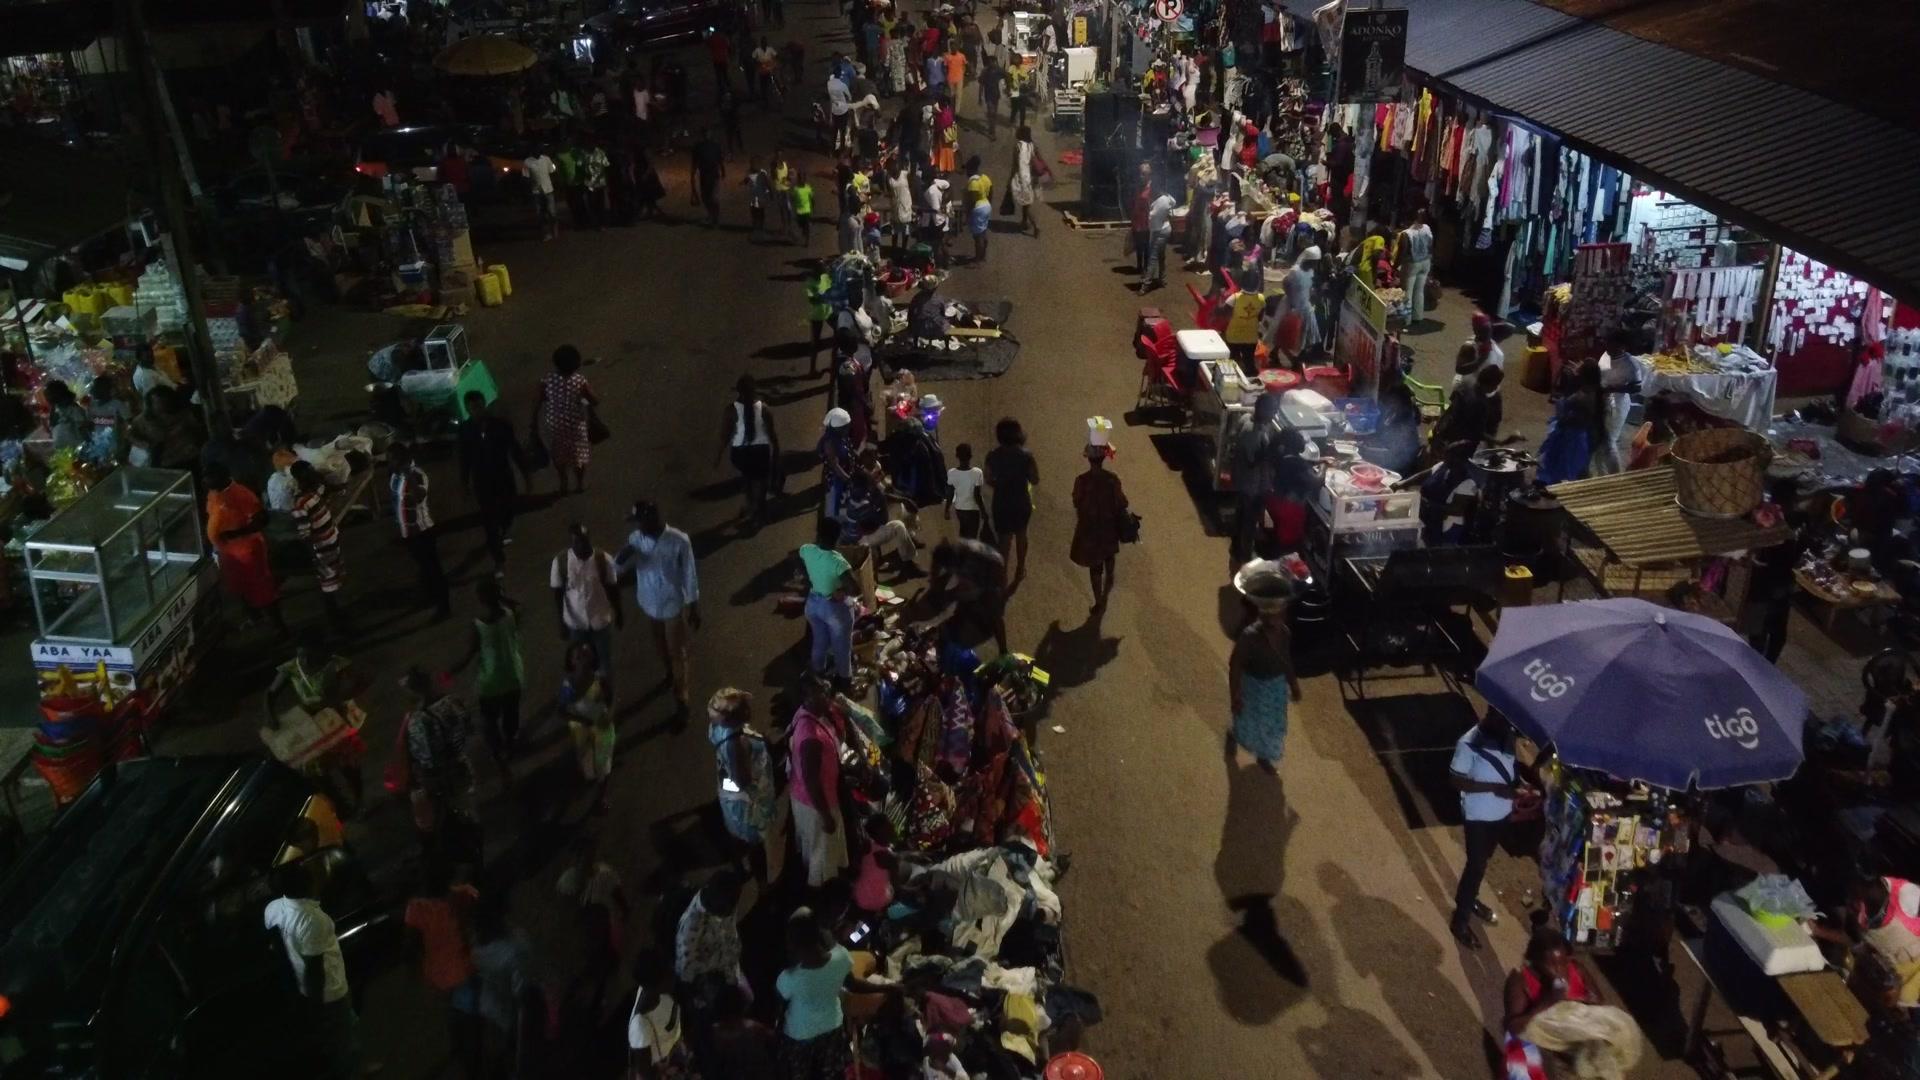 Koforidua Night Street Market Crowded Traders Busy